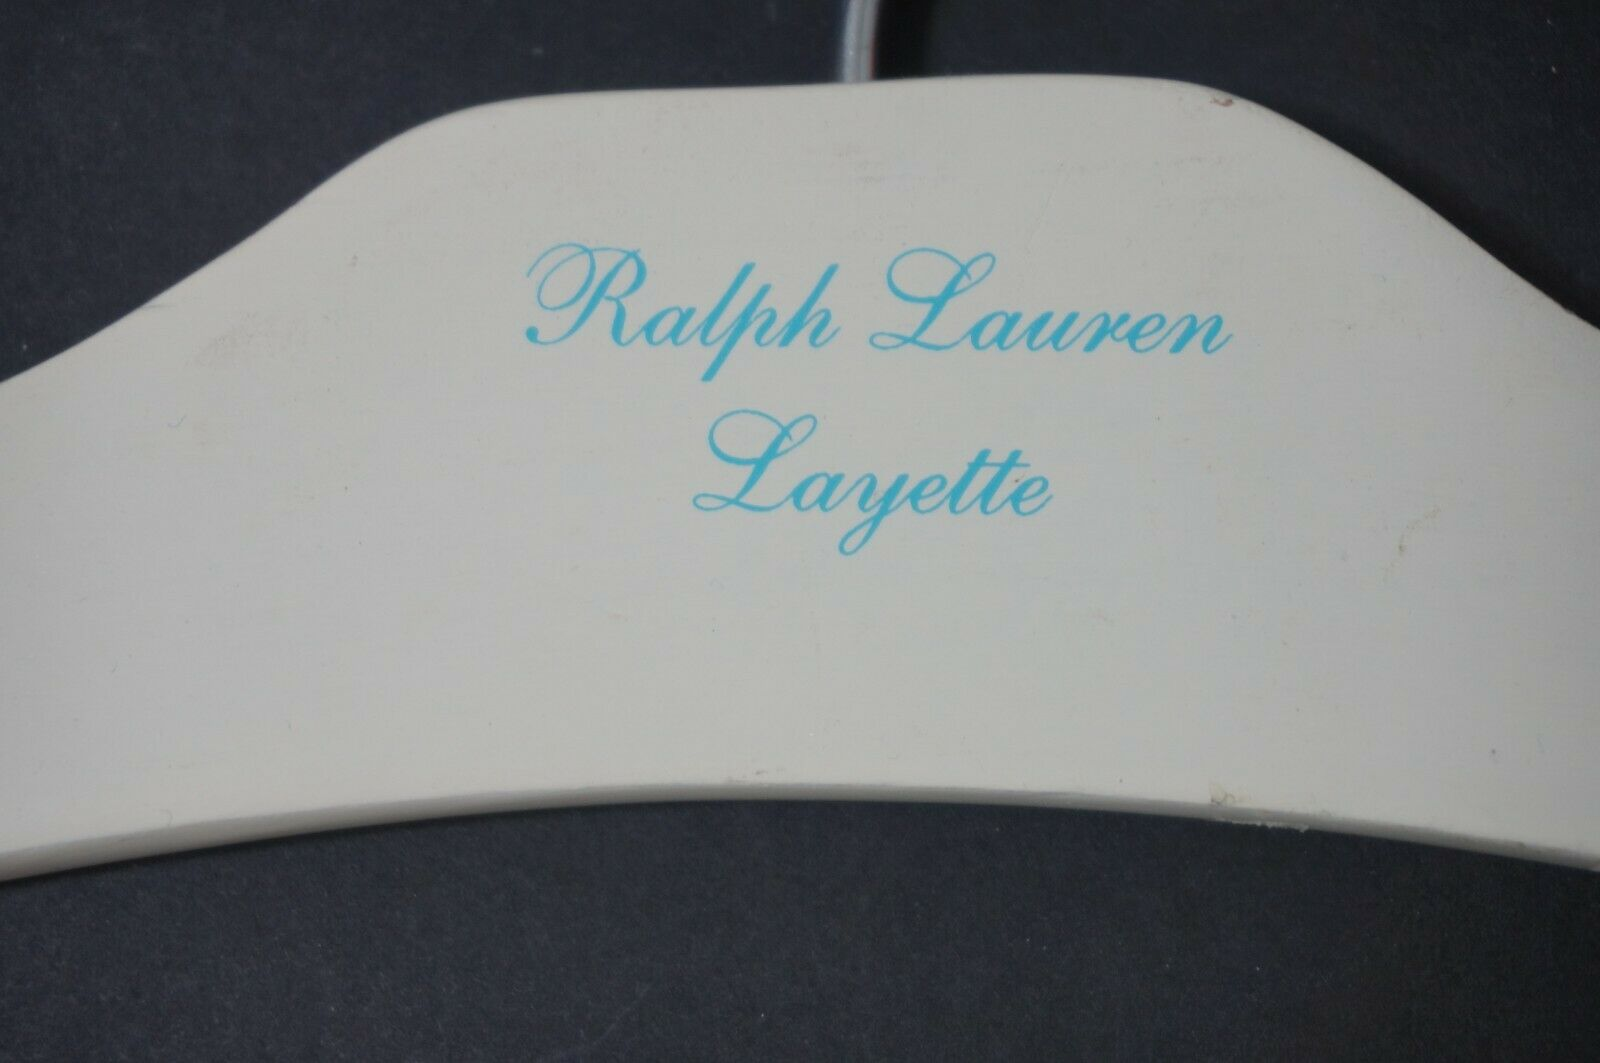 Ralph Lauren Set of 5 Layette Wooden Hangers Cream w bluee Writing